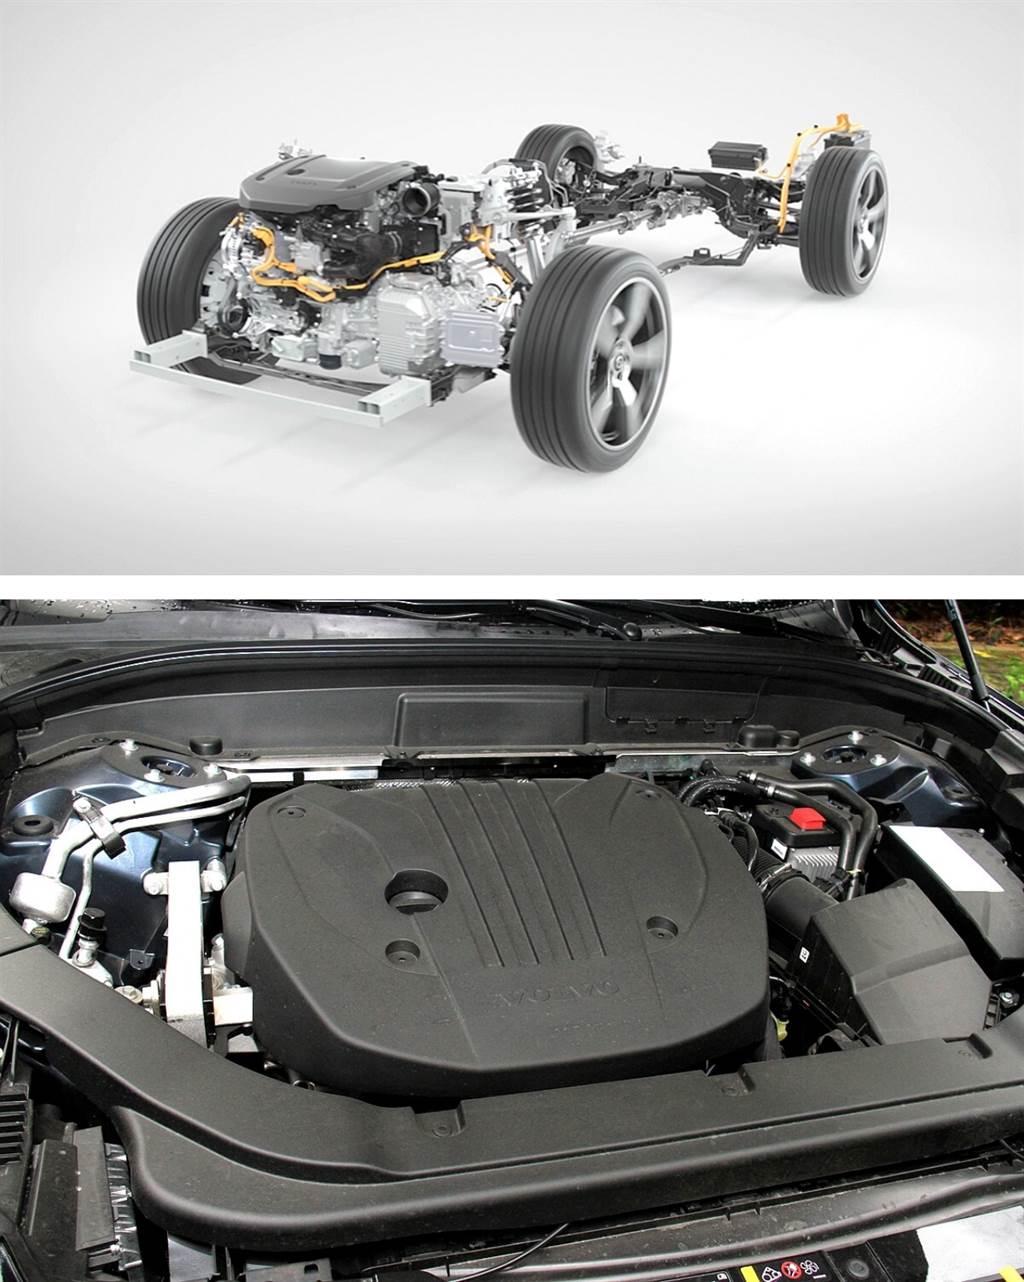 XC60新增的B4動力,擁有197hp/4800~5400rpm、30.6kgm/1500~4200rpm的最大動力輸出,有更順暢的動力曲線與超增壓模式強勁輸出,當車輛起步或瞬間加速時,可以額外供給14hp馬力,瞬間湧現大扭力,除加速更有感之外,也連帶有節能減碳的優勢,其實測平均油耗每公升可跑13.2公里,對於重達1,862kg的中大型SUV而言,能有純內燃動力小型車的油耗表現,也是難以忽視的亮點!